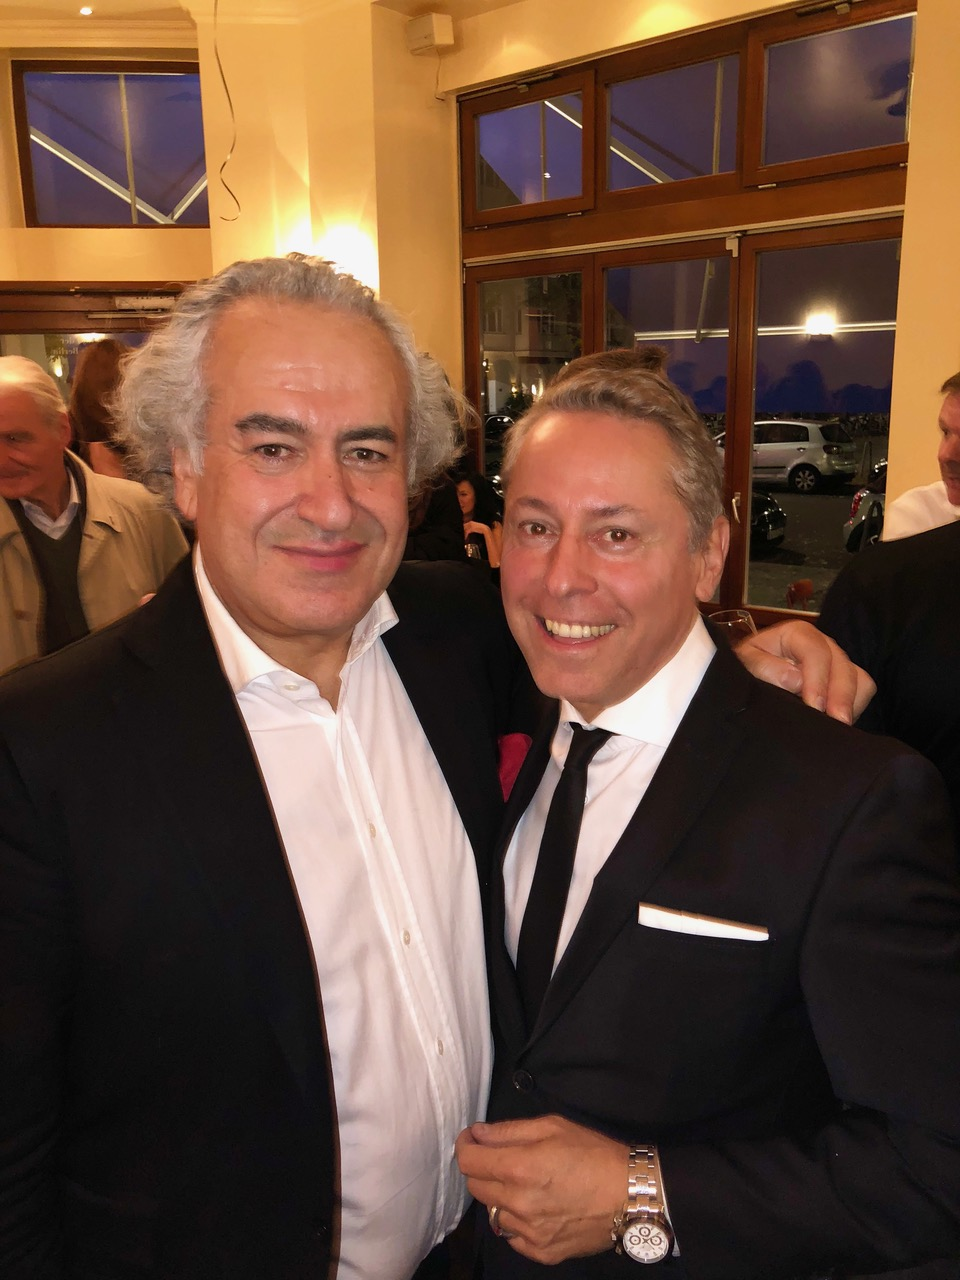 Opening Reopening Adnan Restaurant Promirestaurant Gerry Concierge Adnan Oral Inhaber Gastronom Promiwirt IMG_E5030